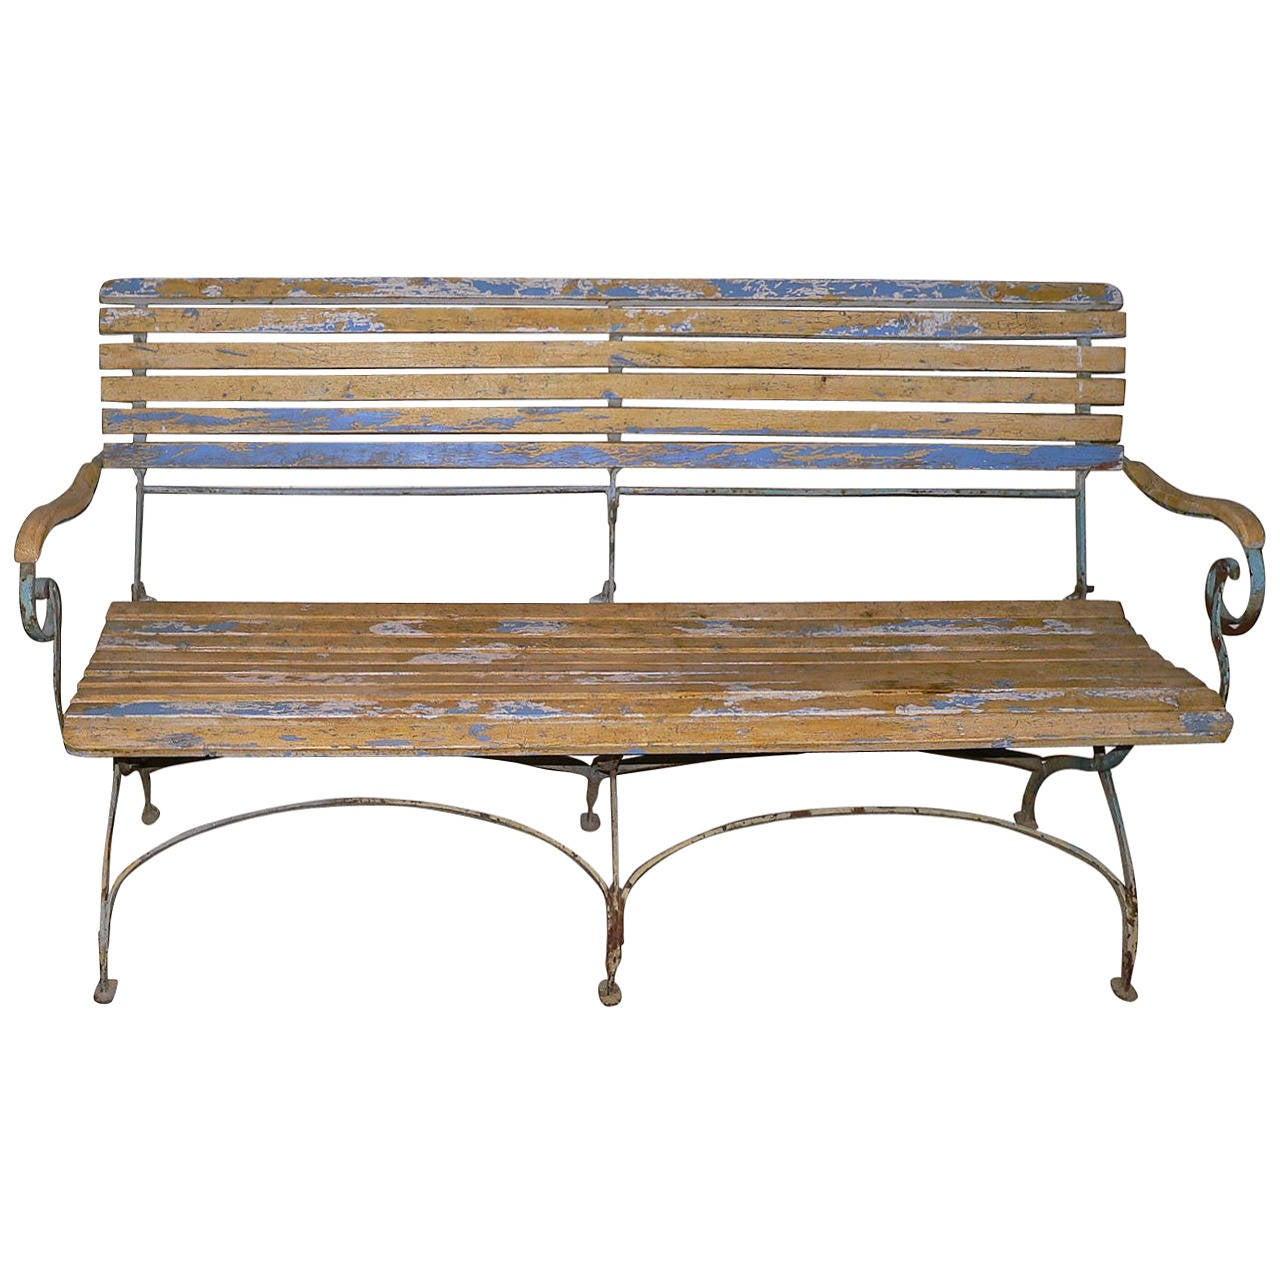 French Folding Garden Bench At 1stdibs